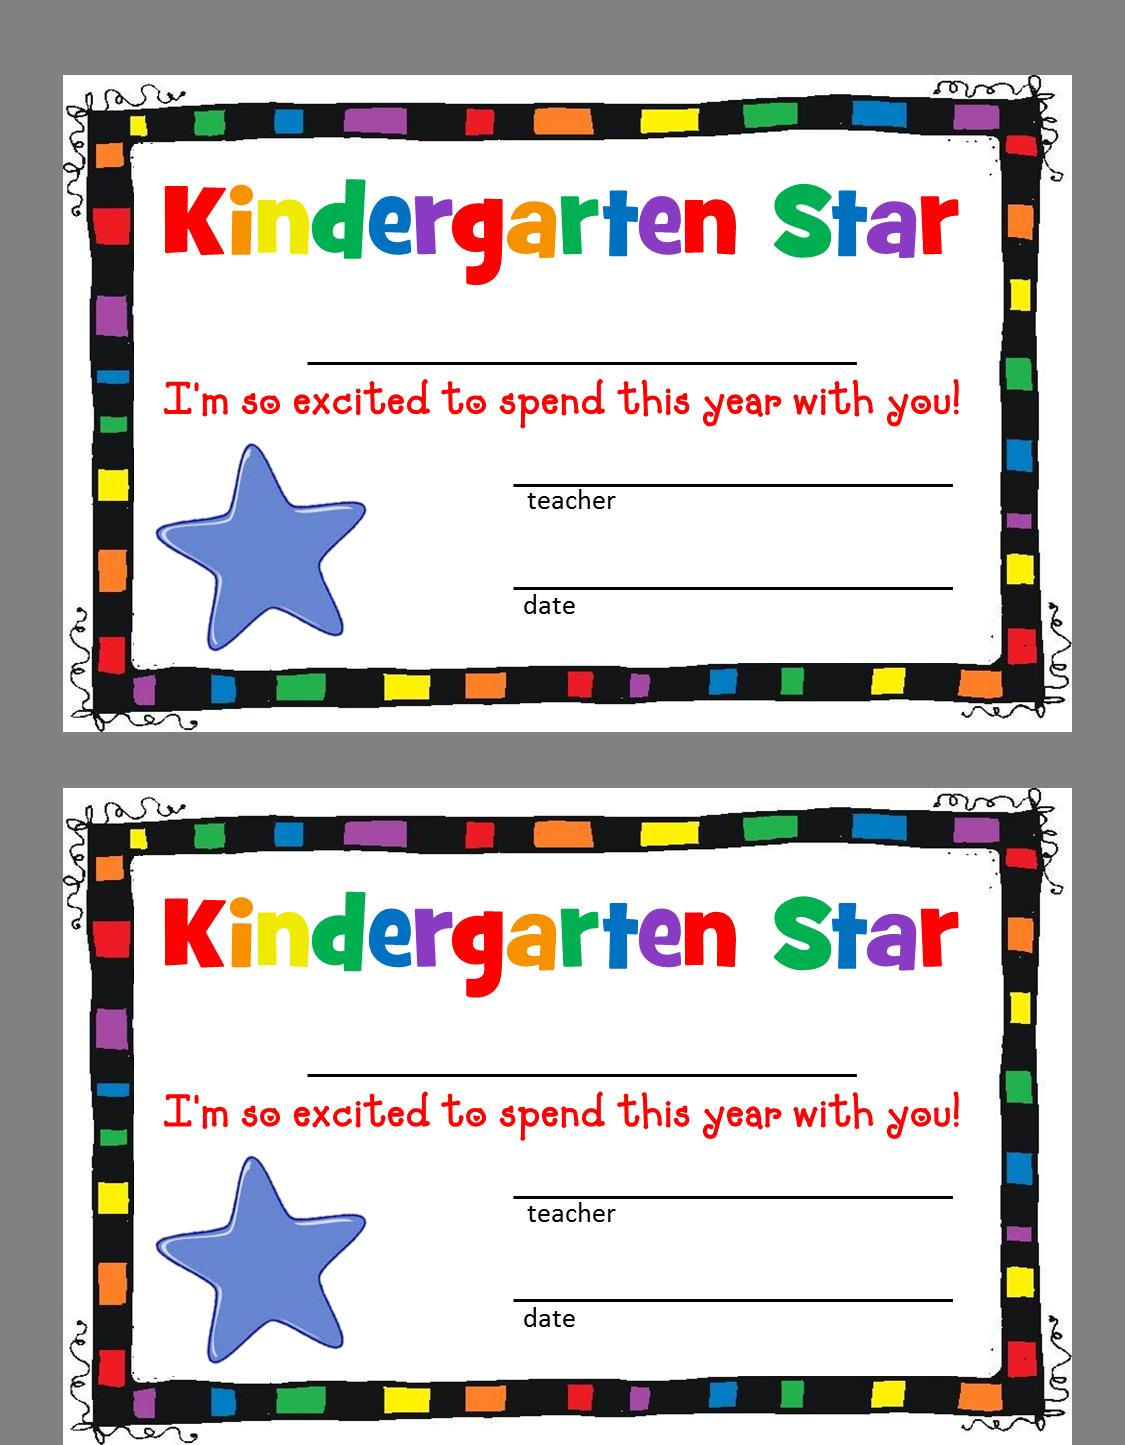 Preschool star clipart jpg royalty free library Free Printable Preschool Borders | Clipart Panda - Free Clipart Images jpg royalty free library